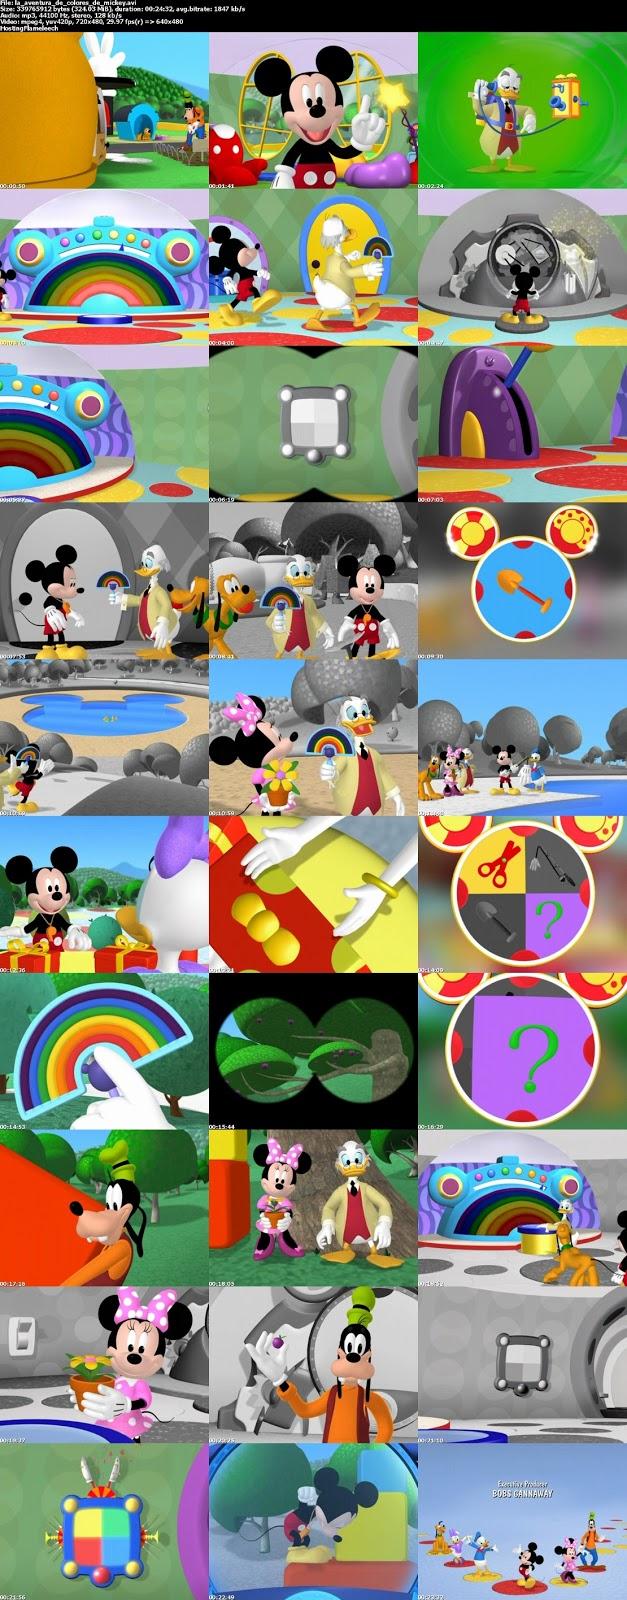 Sekai-DibujosAnimados: La casa de Mickey Mouse: Aventura de colores ...